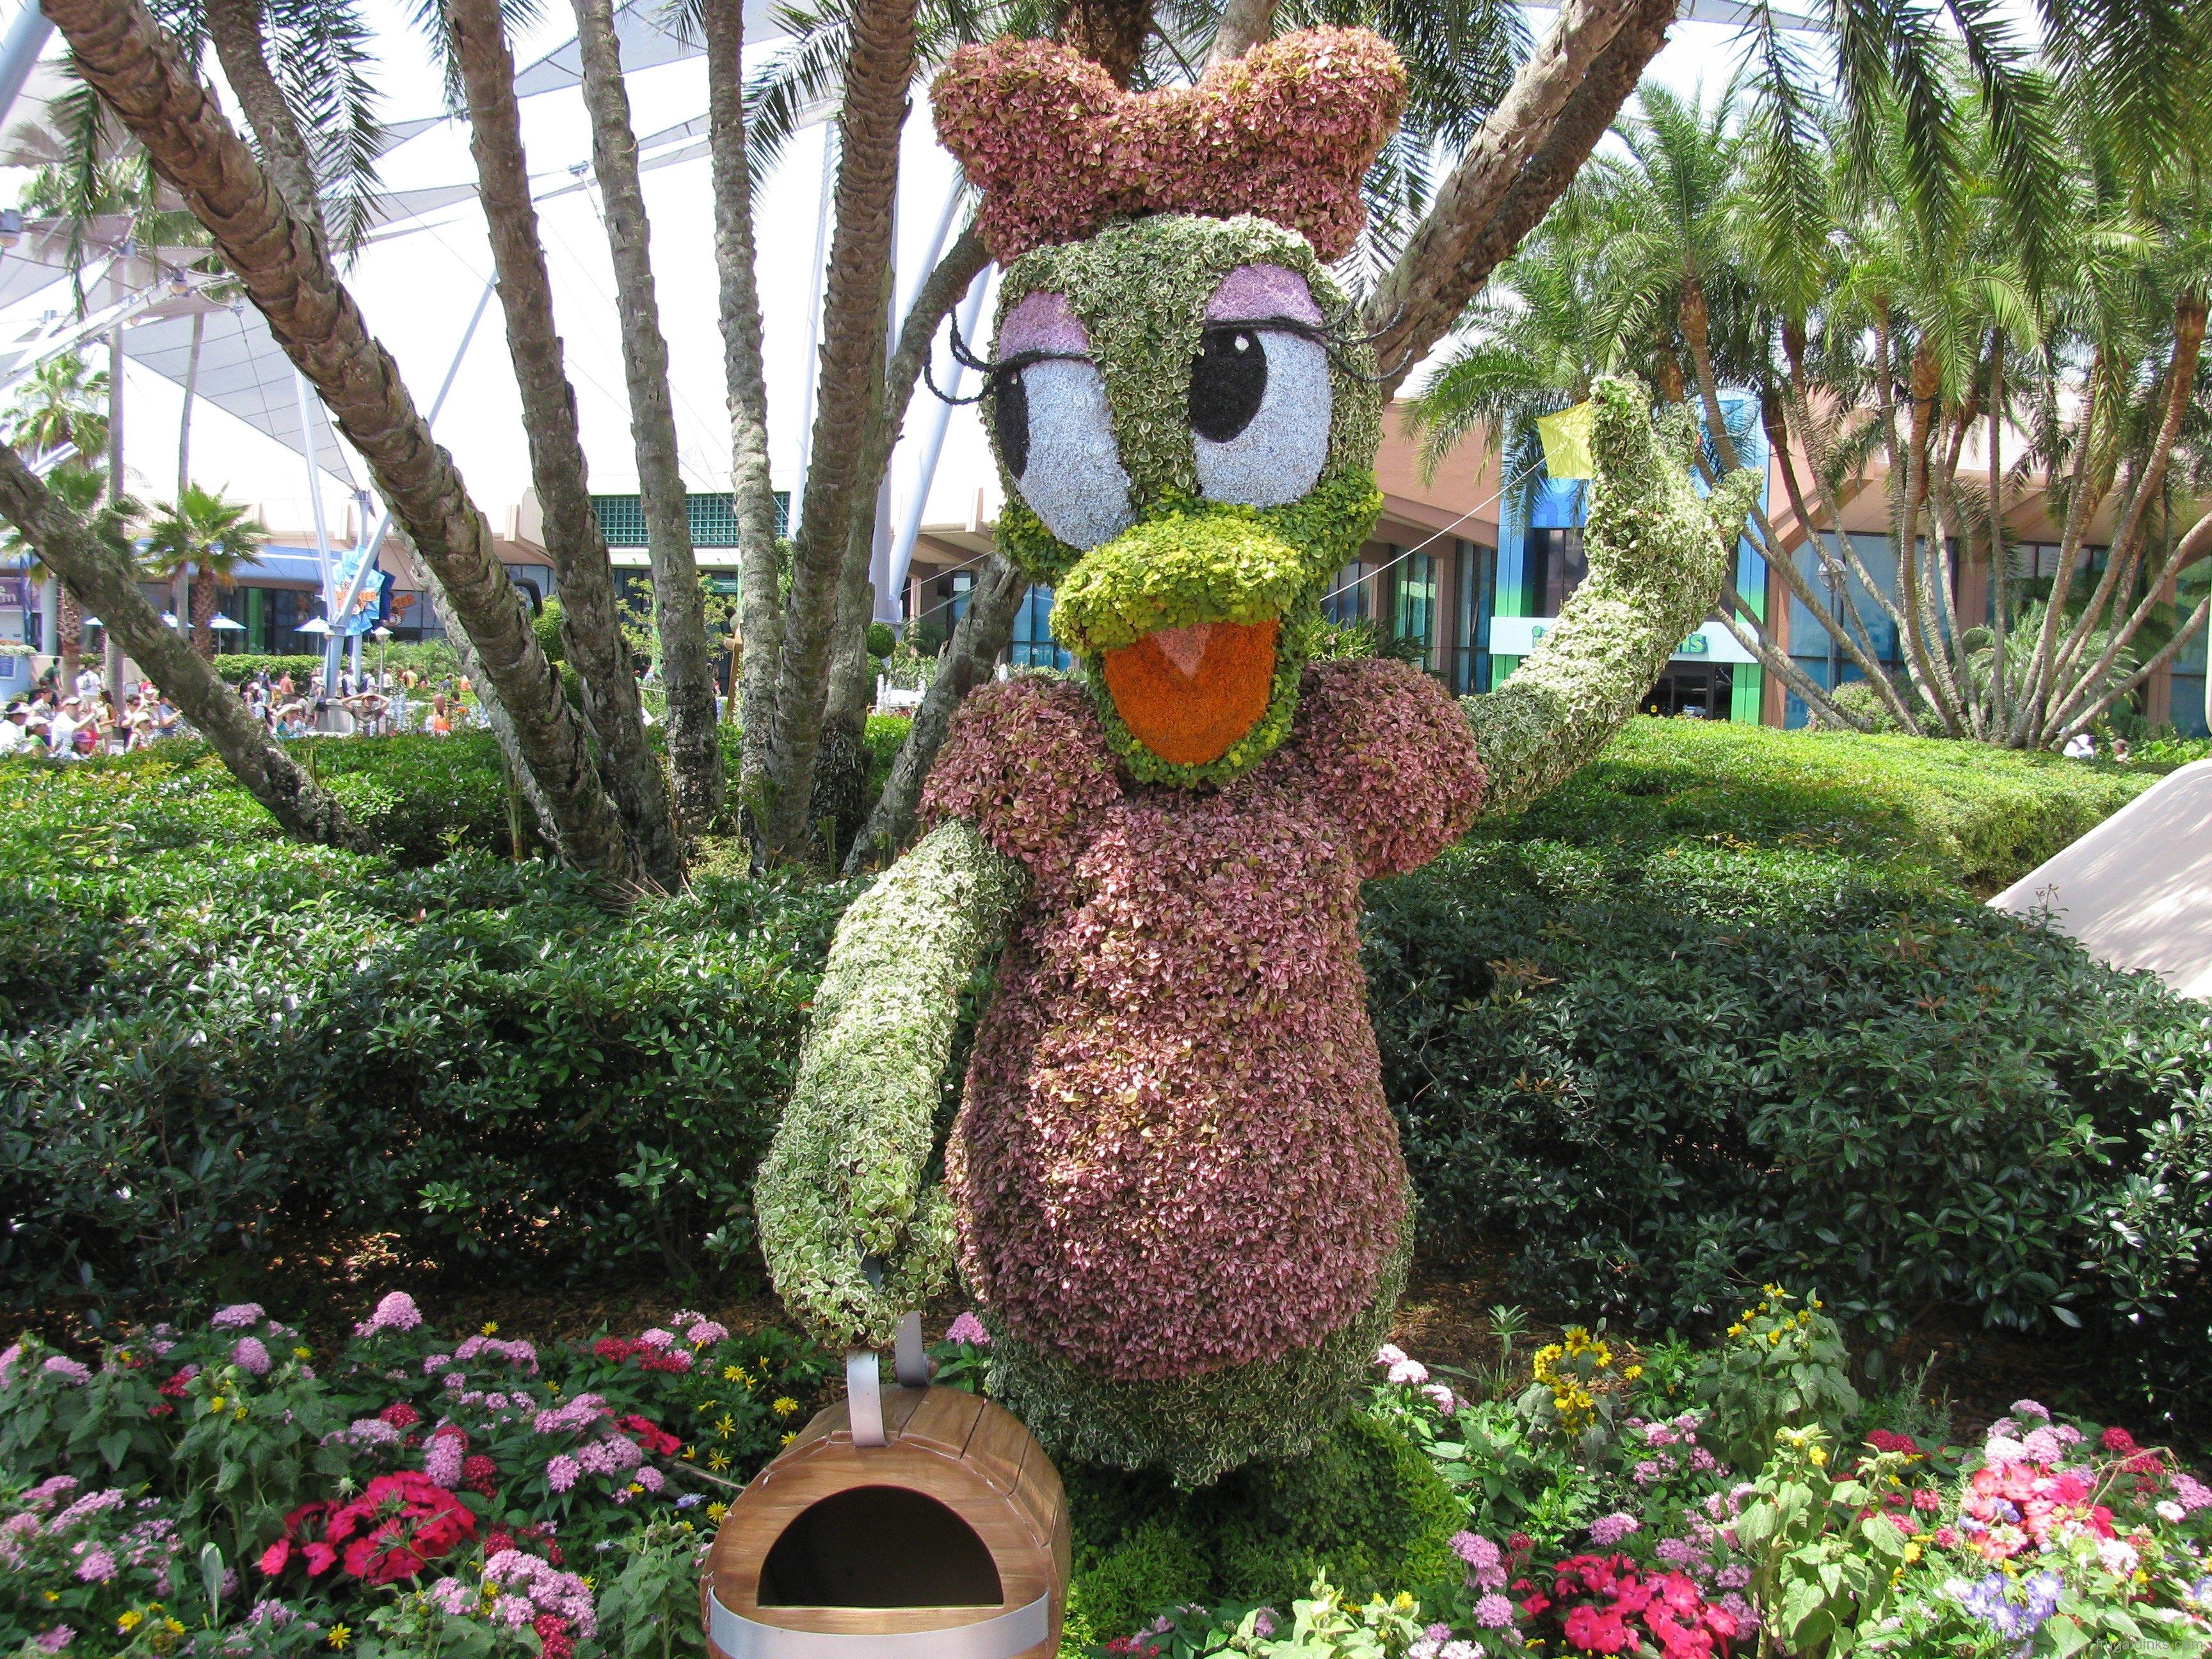 Disney Topiary Part - 17: 2011-epcot-flower-garden-festival-8